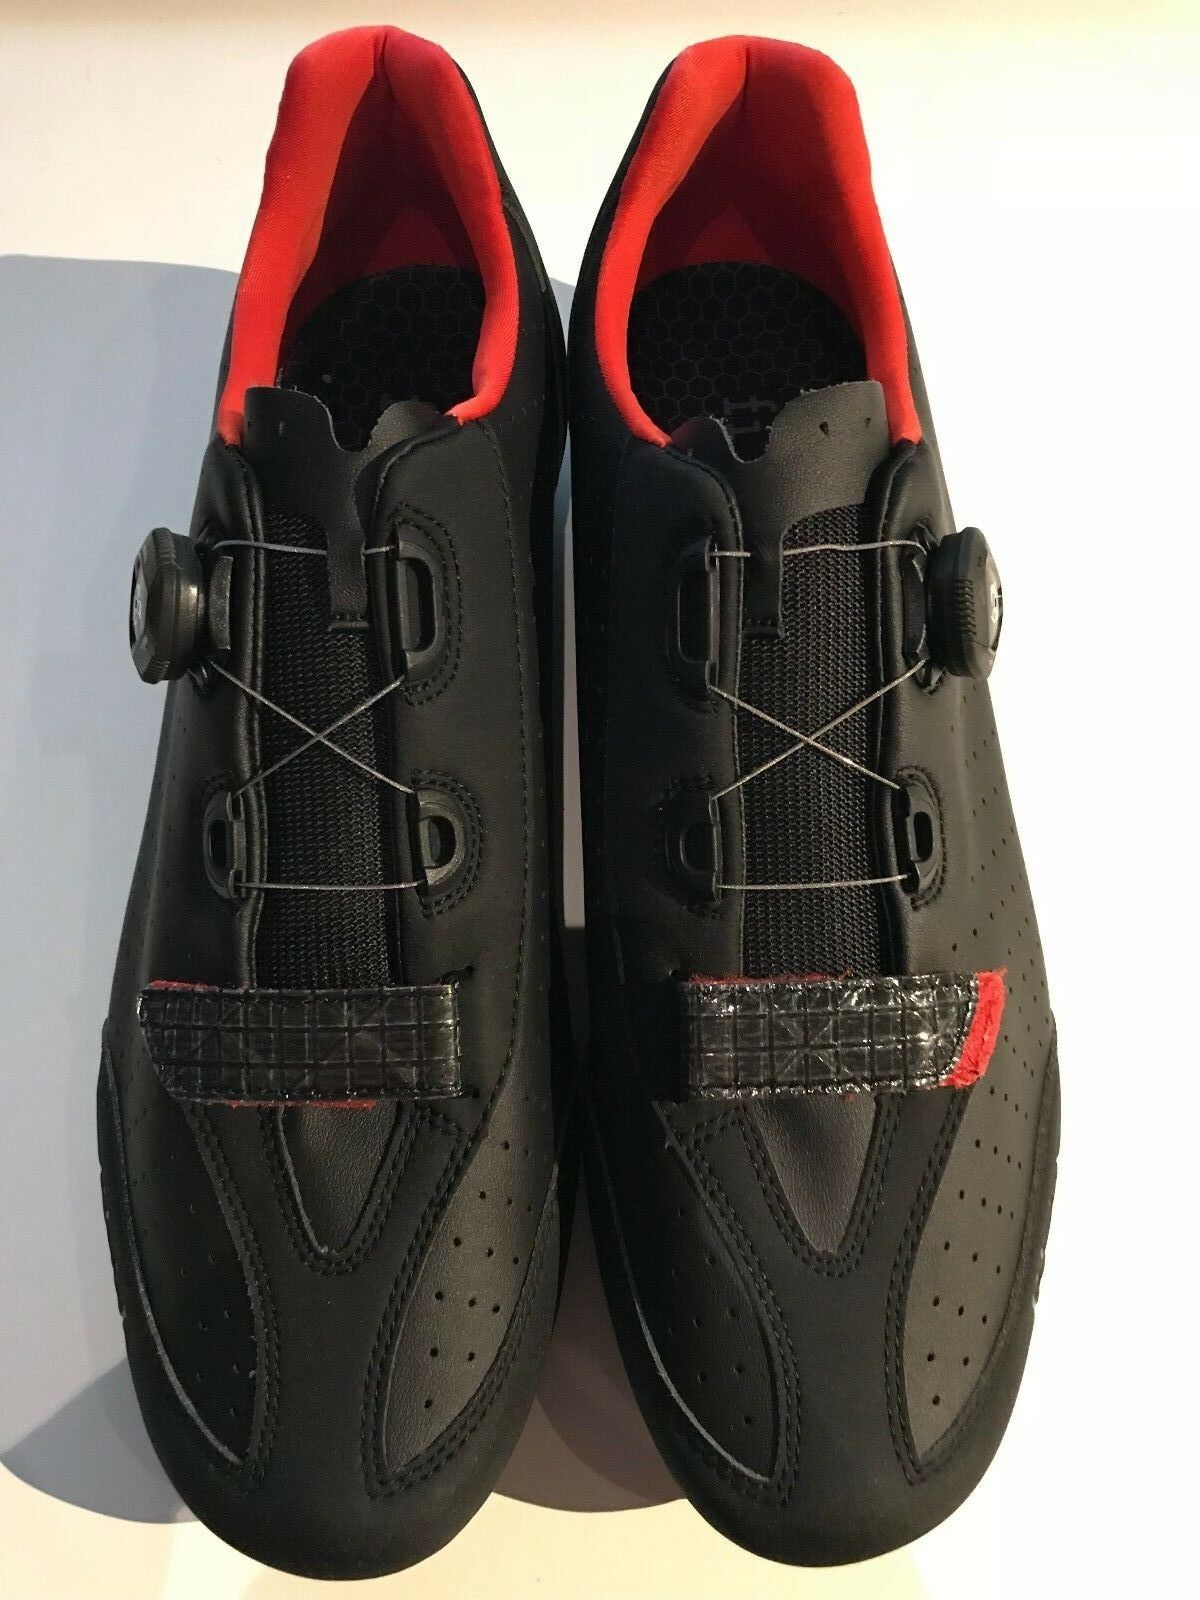 Fi'zi k R3 Boa Man Road shoes, UK, US 12.5